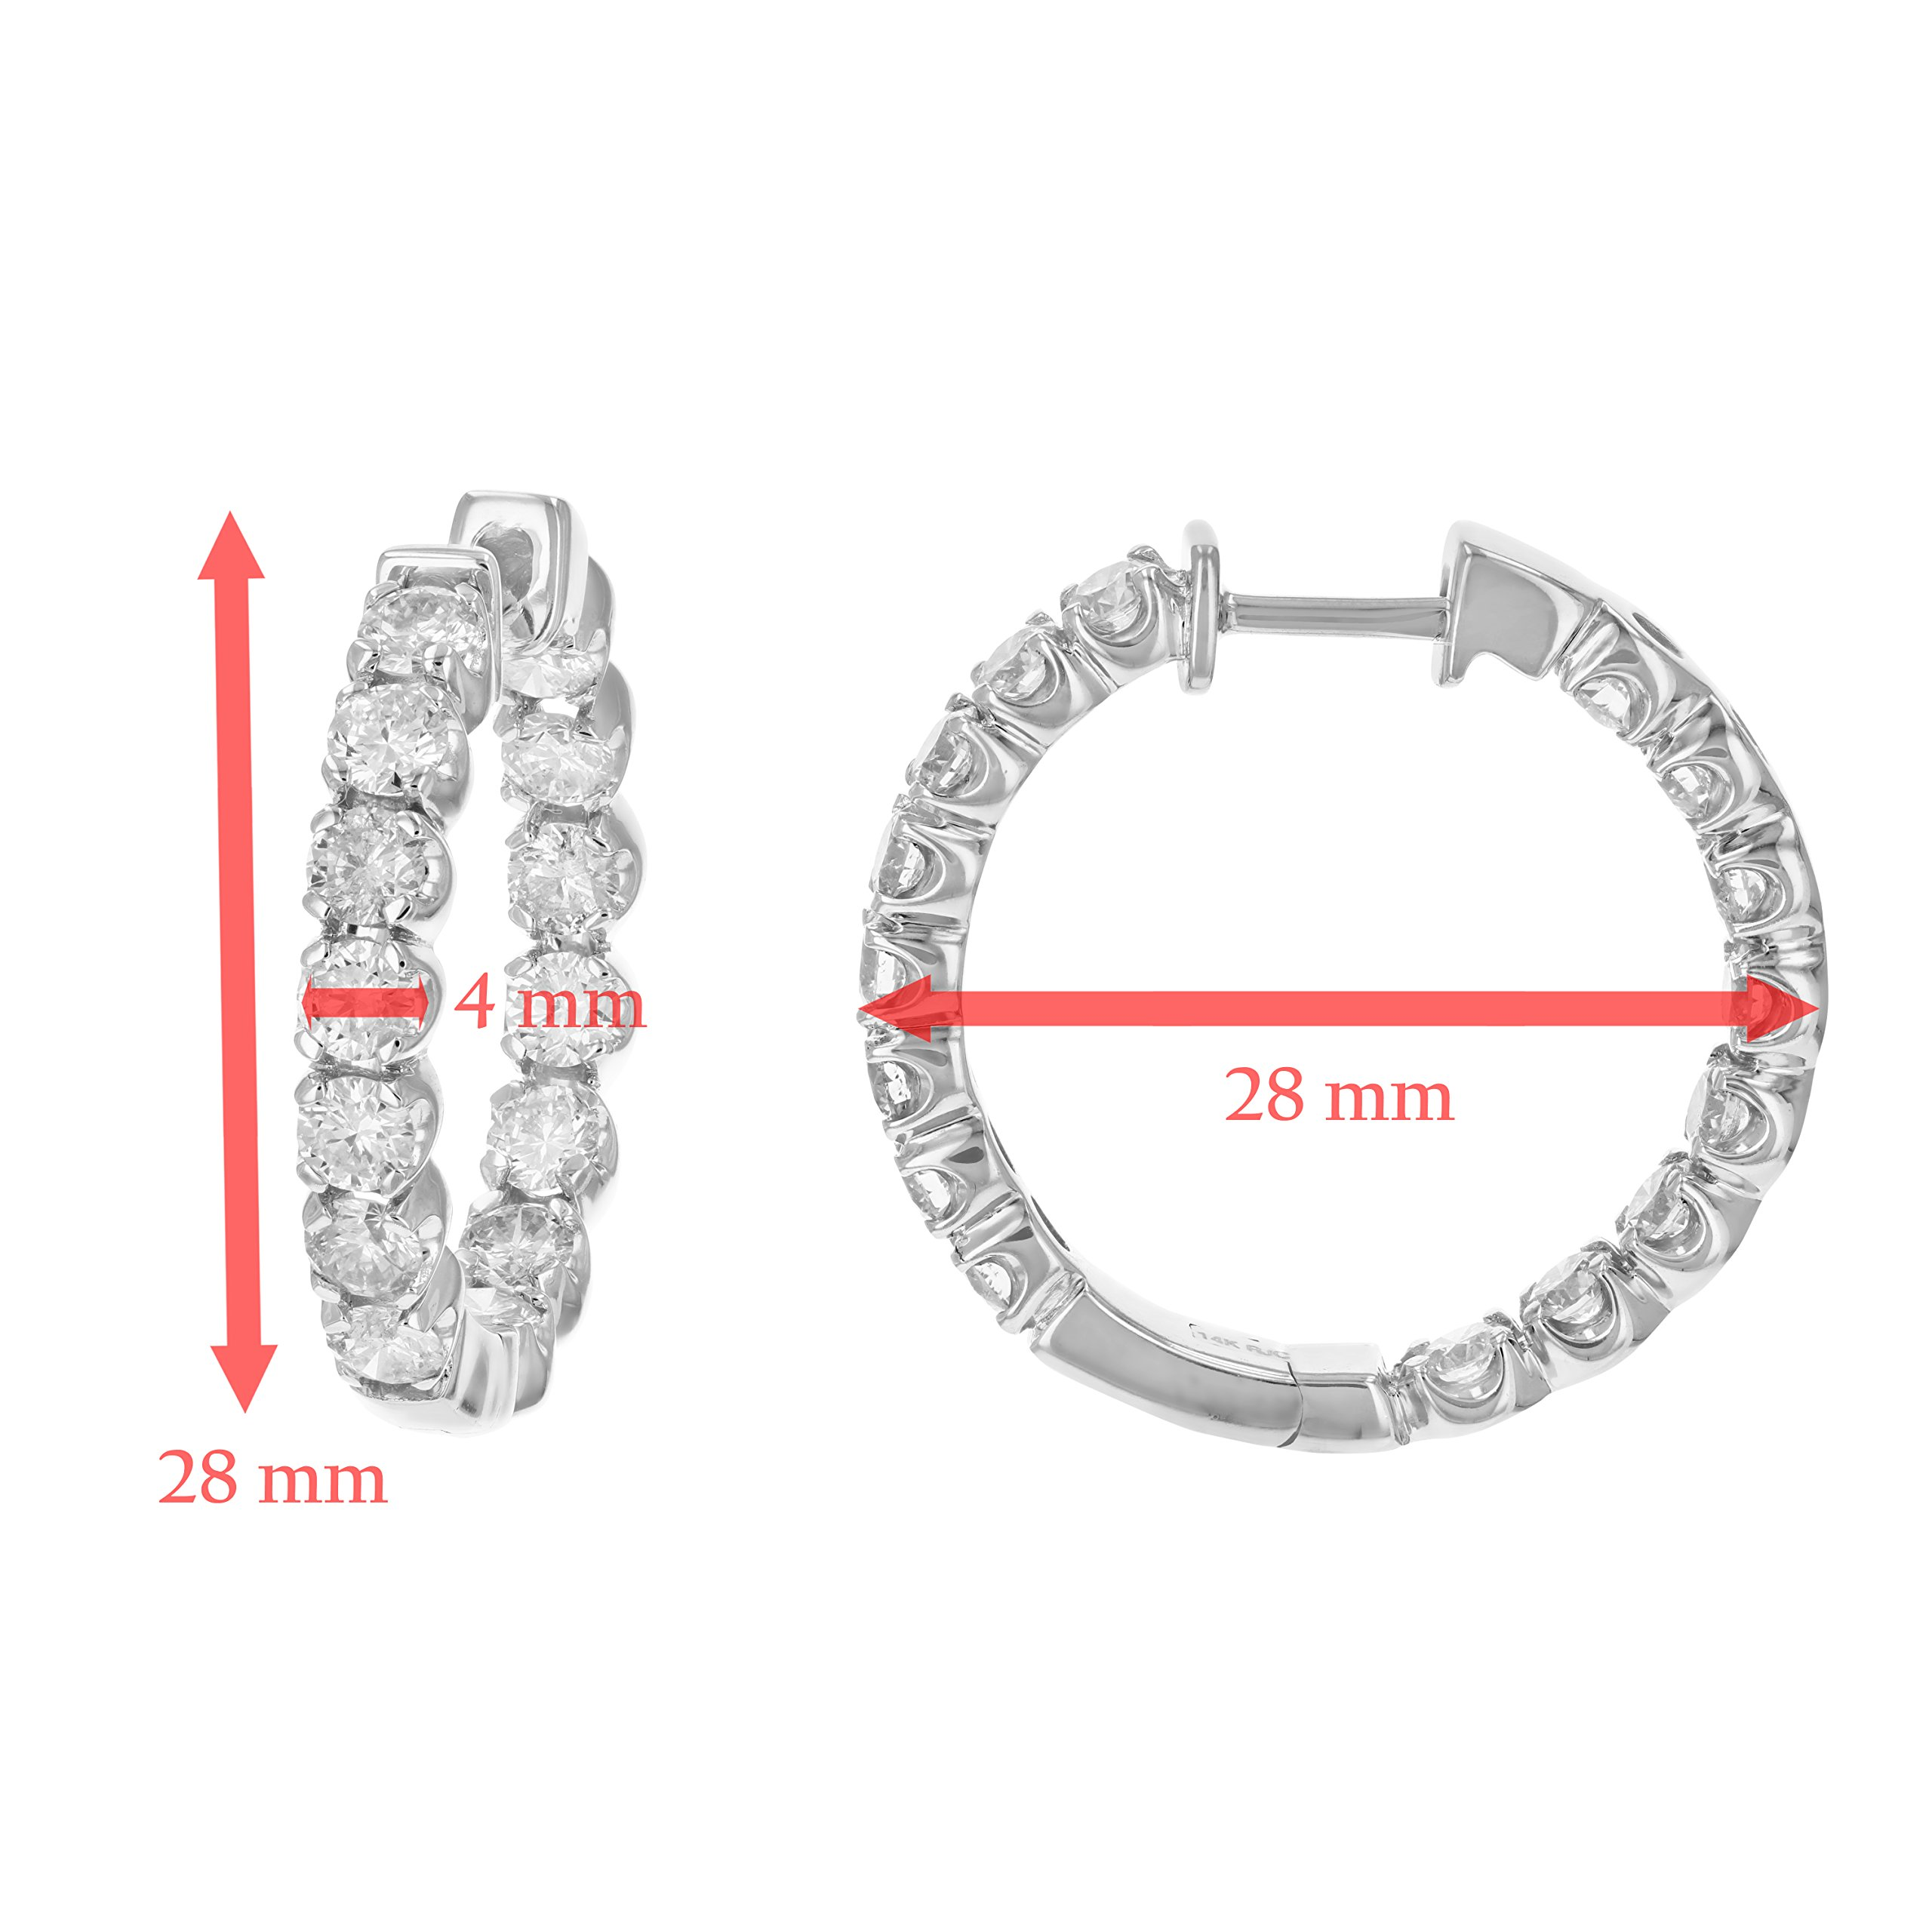 4 cttw SI2-I1 Certified 14K White Gold Diamond Inside Out Hoop Earrings (J-K) by Vir Jewels (Image #3)